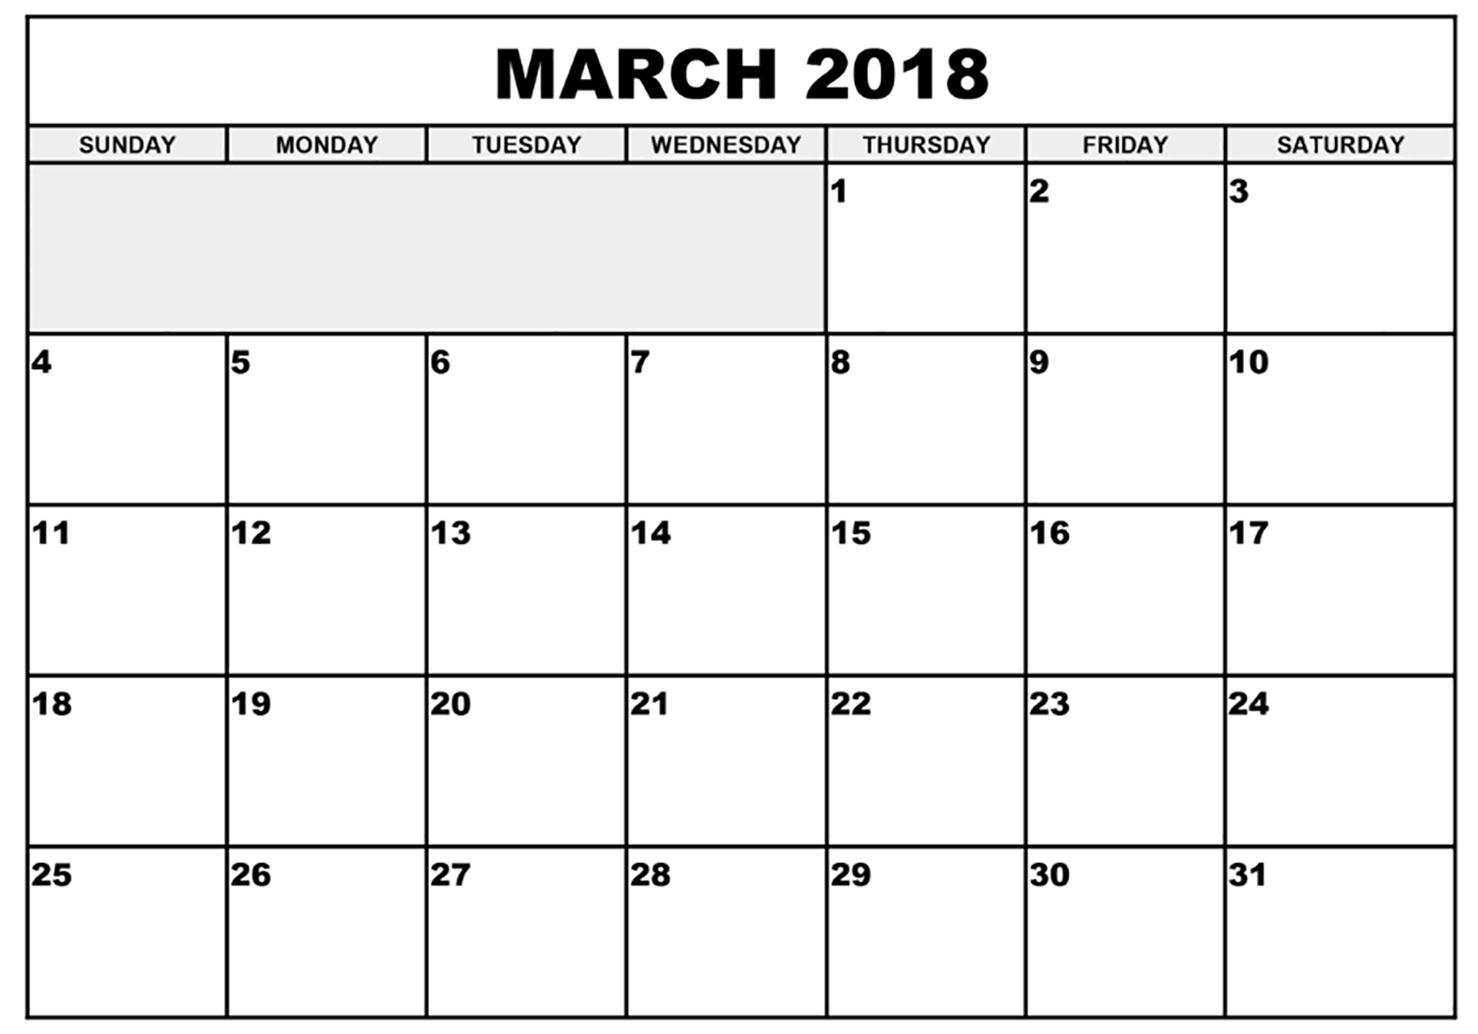 Printable March 2018 Calendar - Printable Monthly Calendar